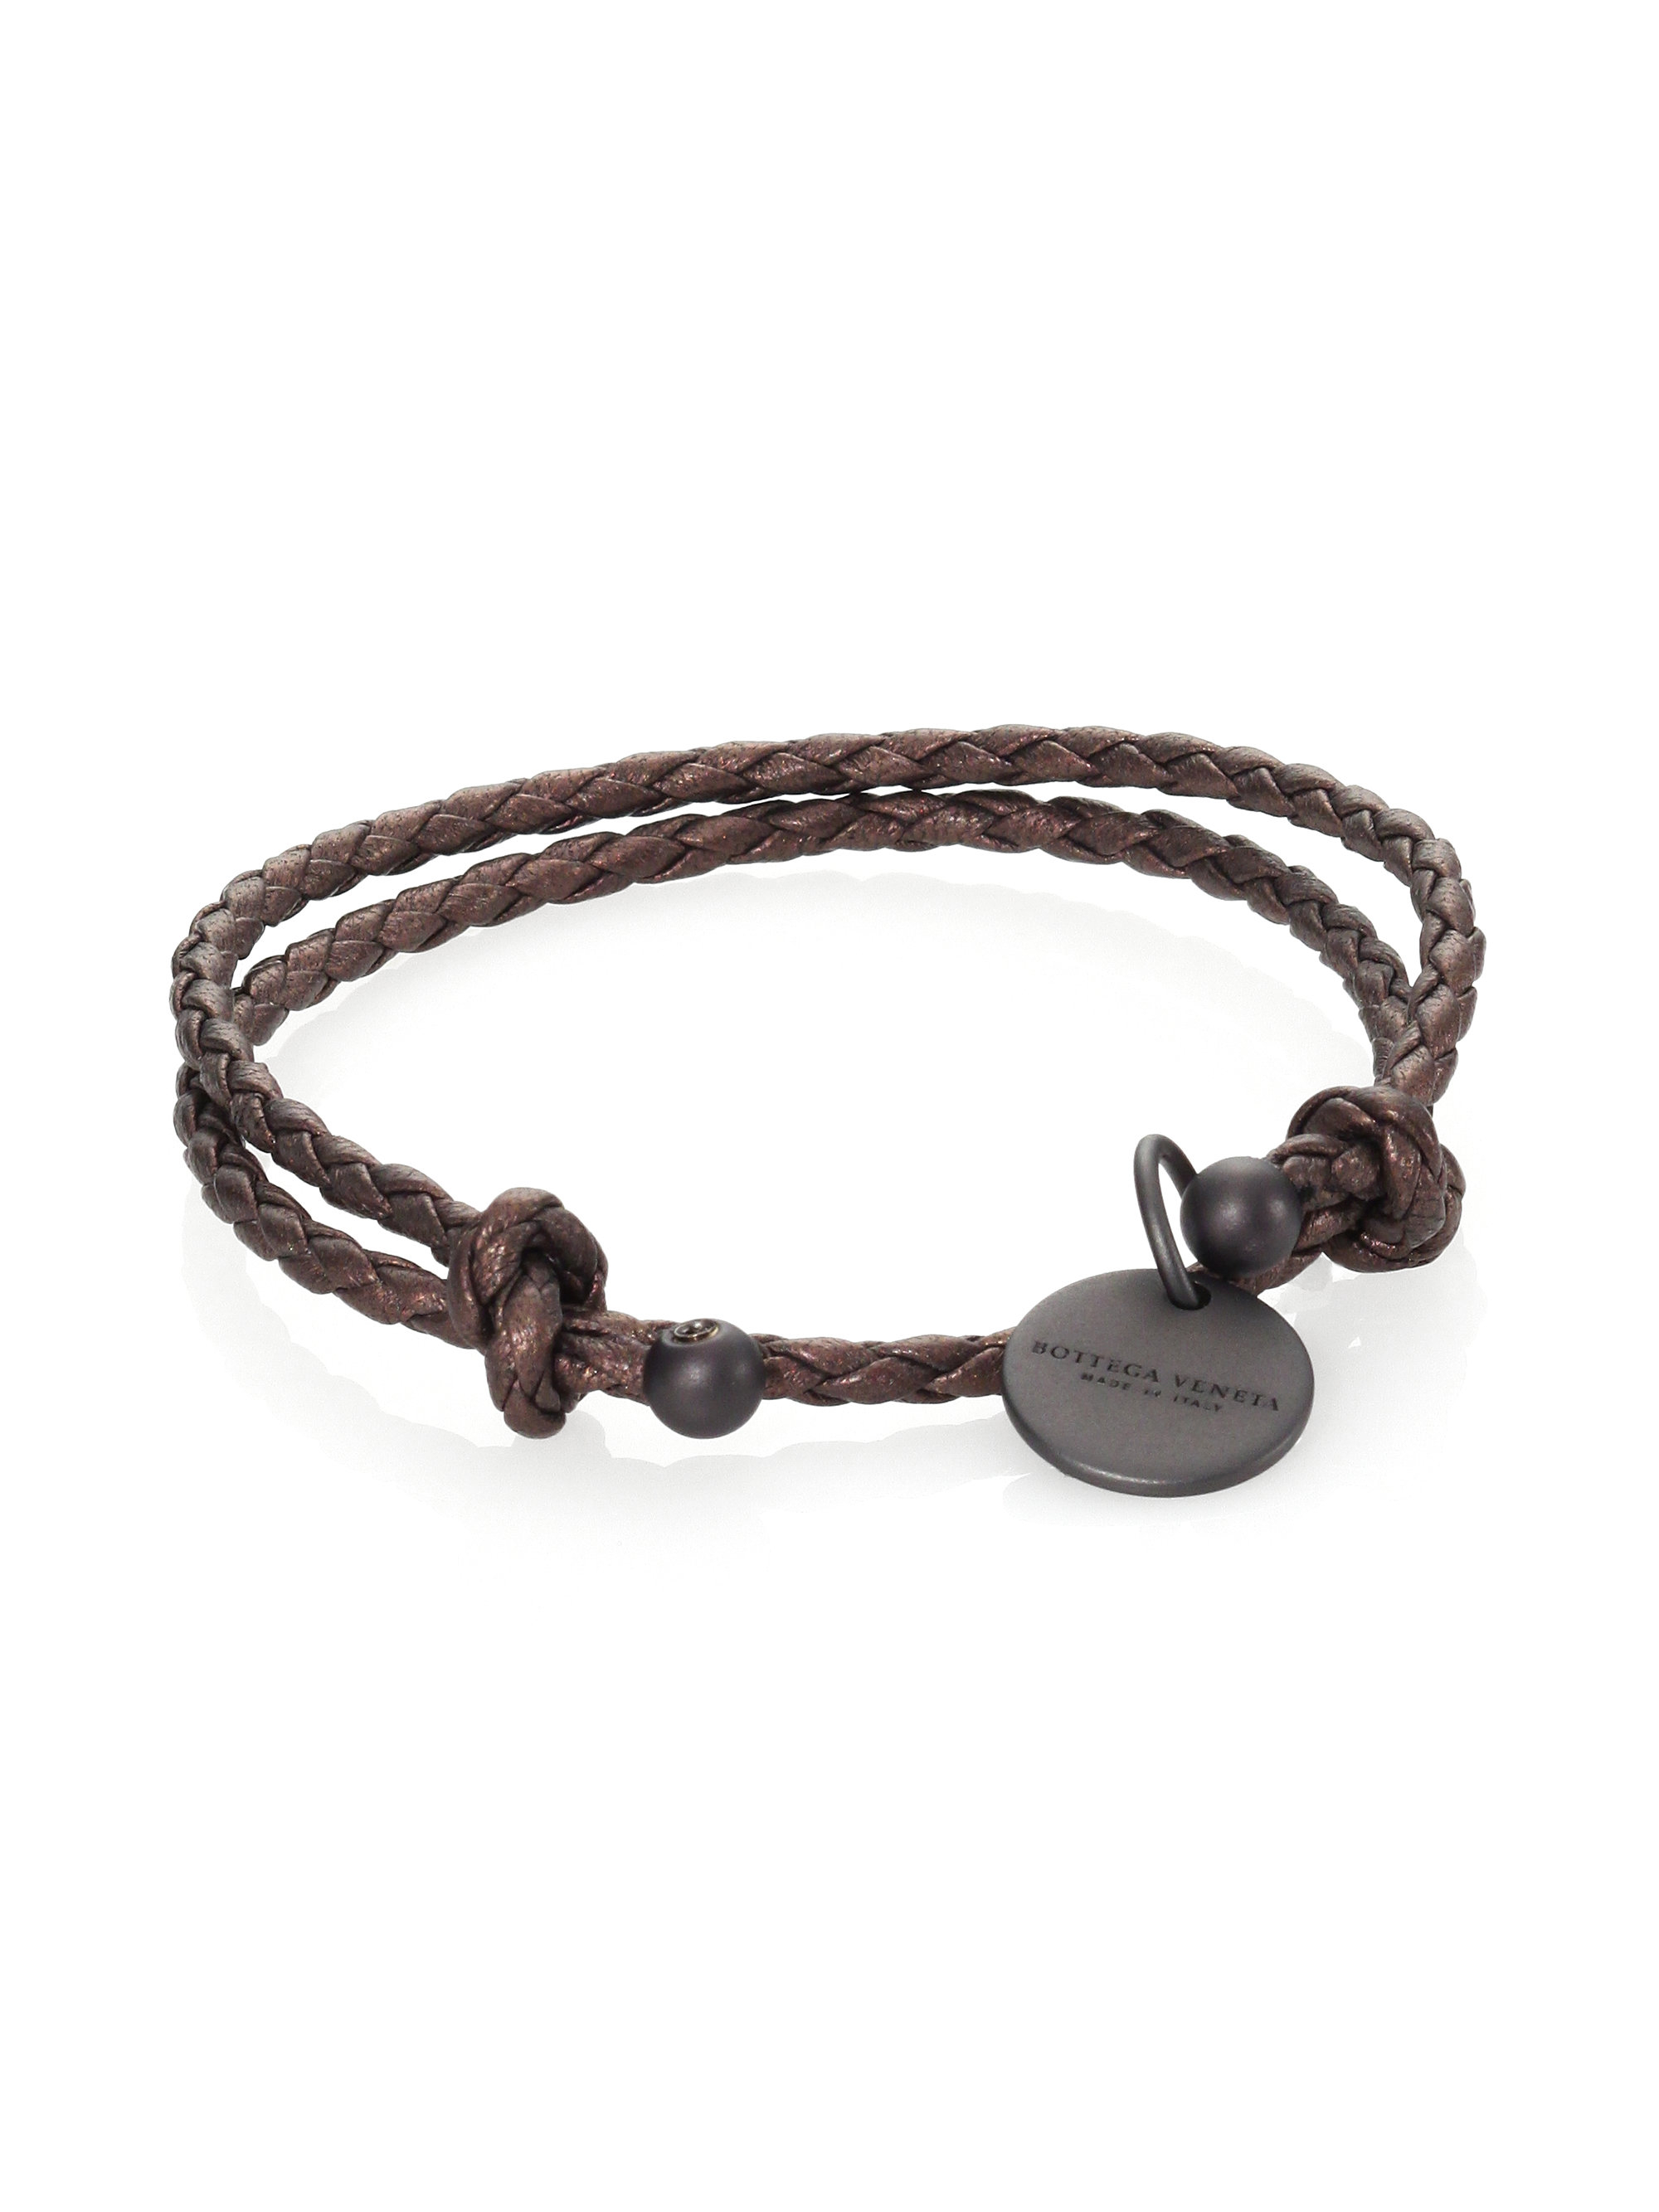 bottega veneta braided leather charm bracelet in brown